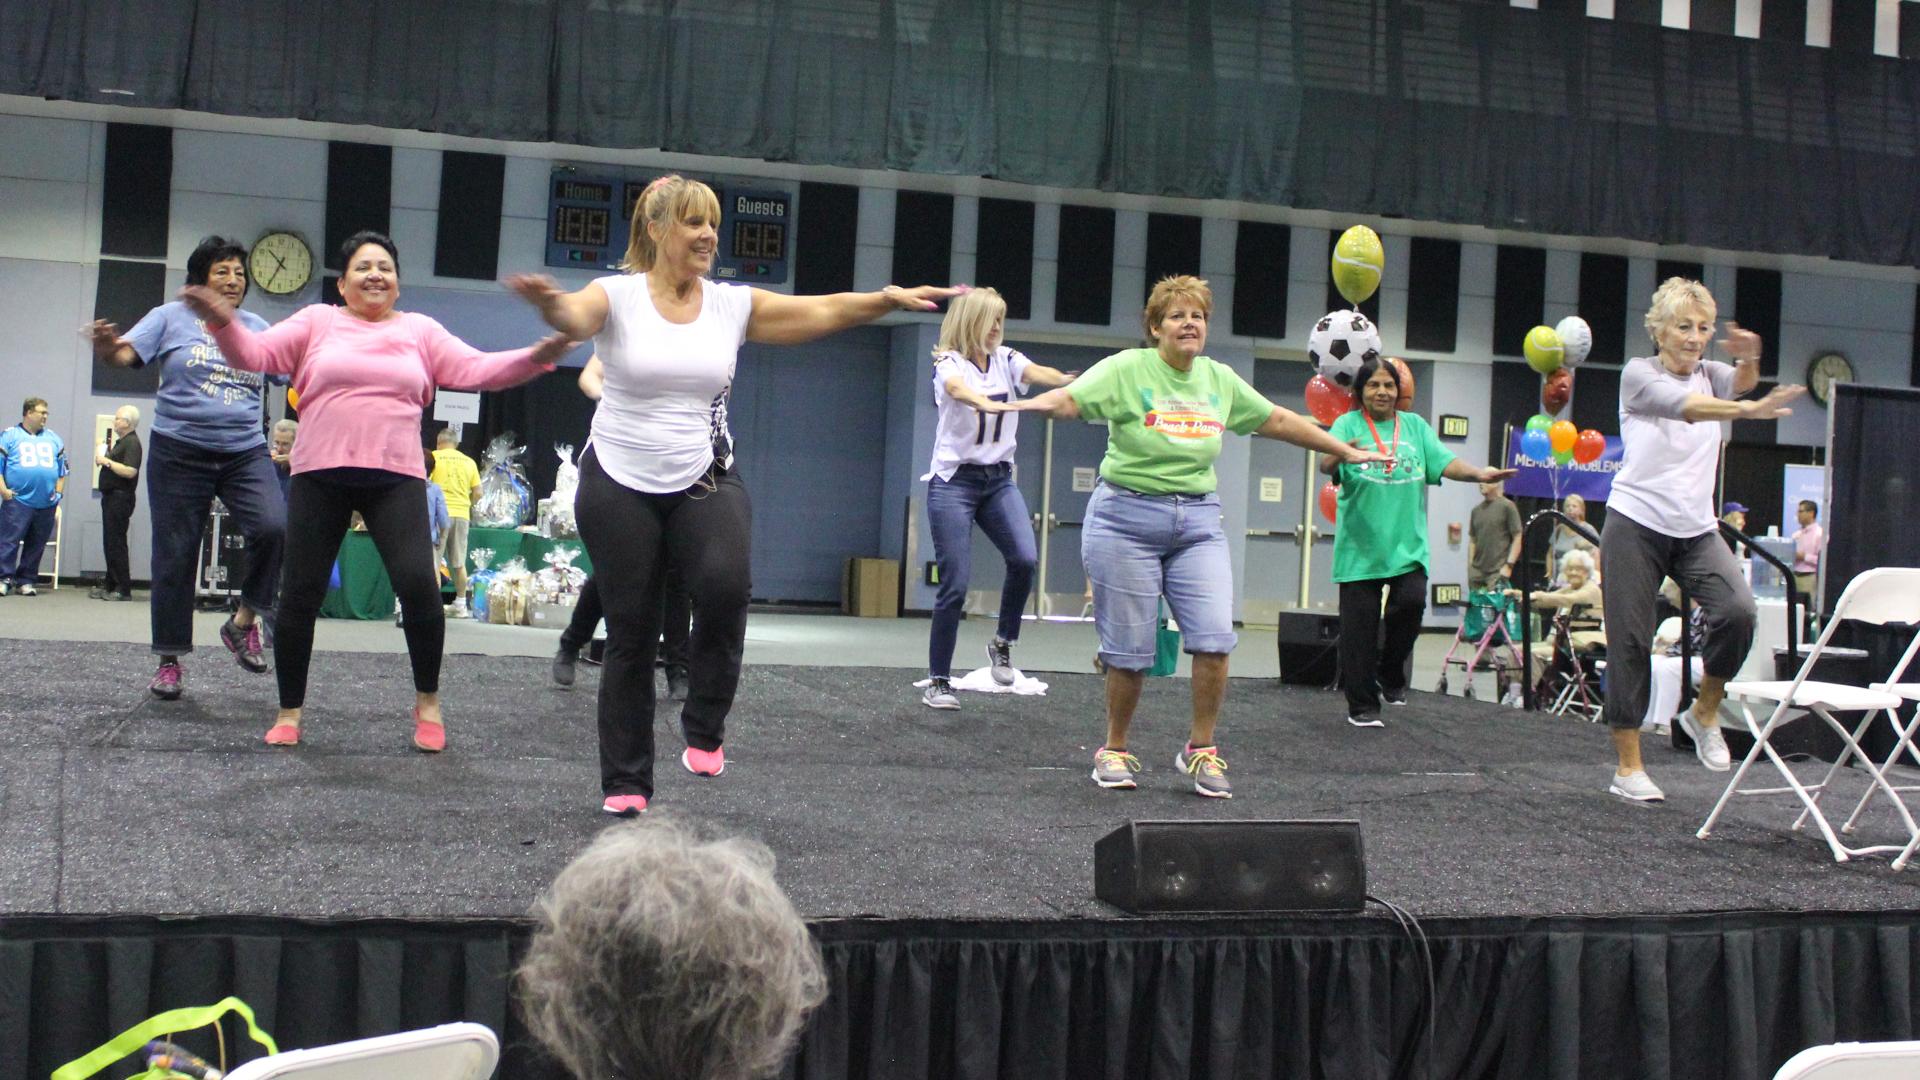 Aerobics demonstration